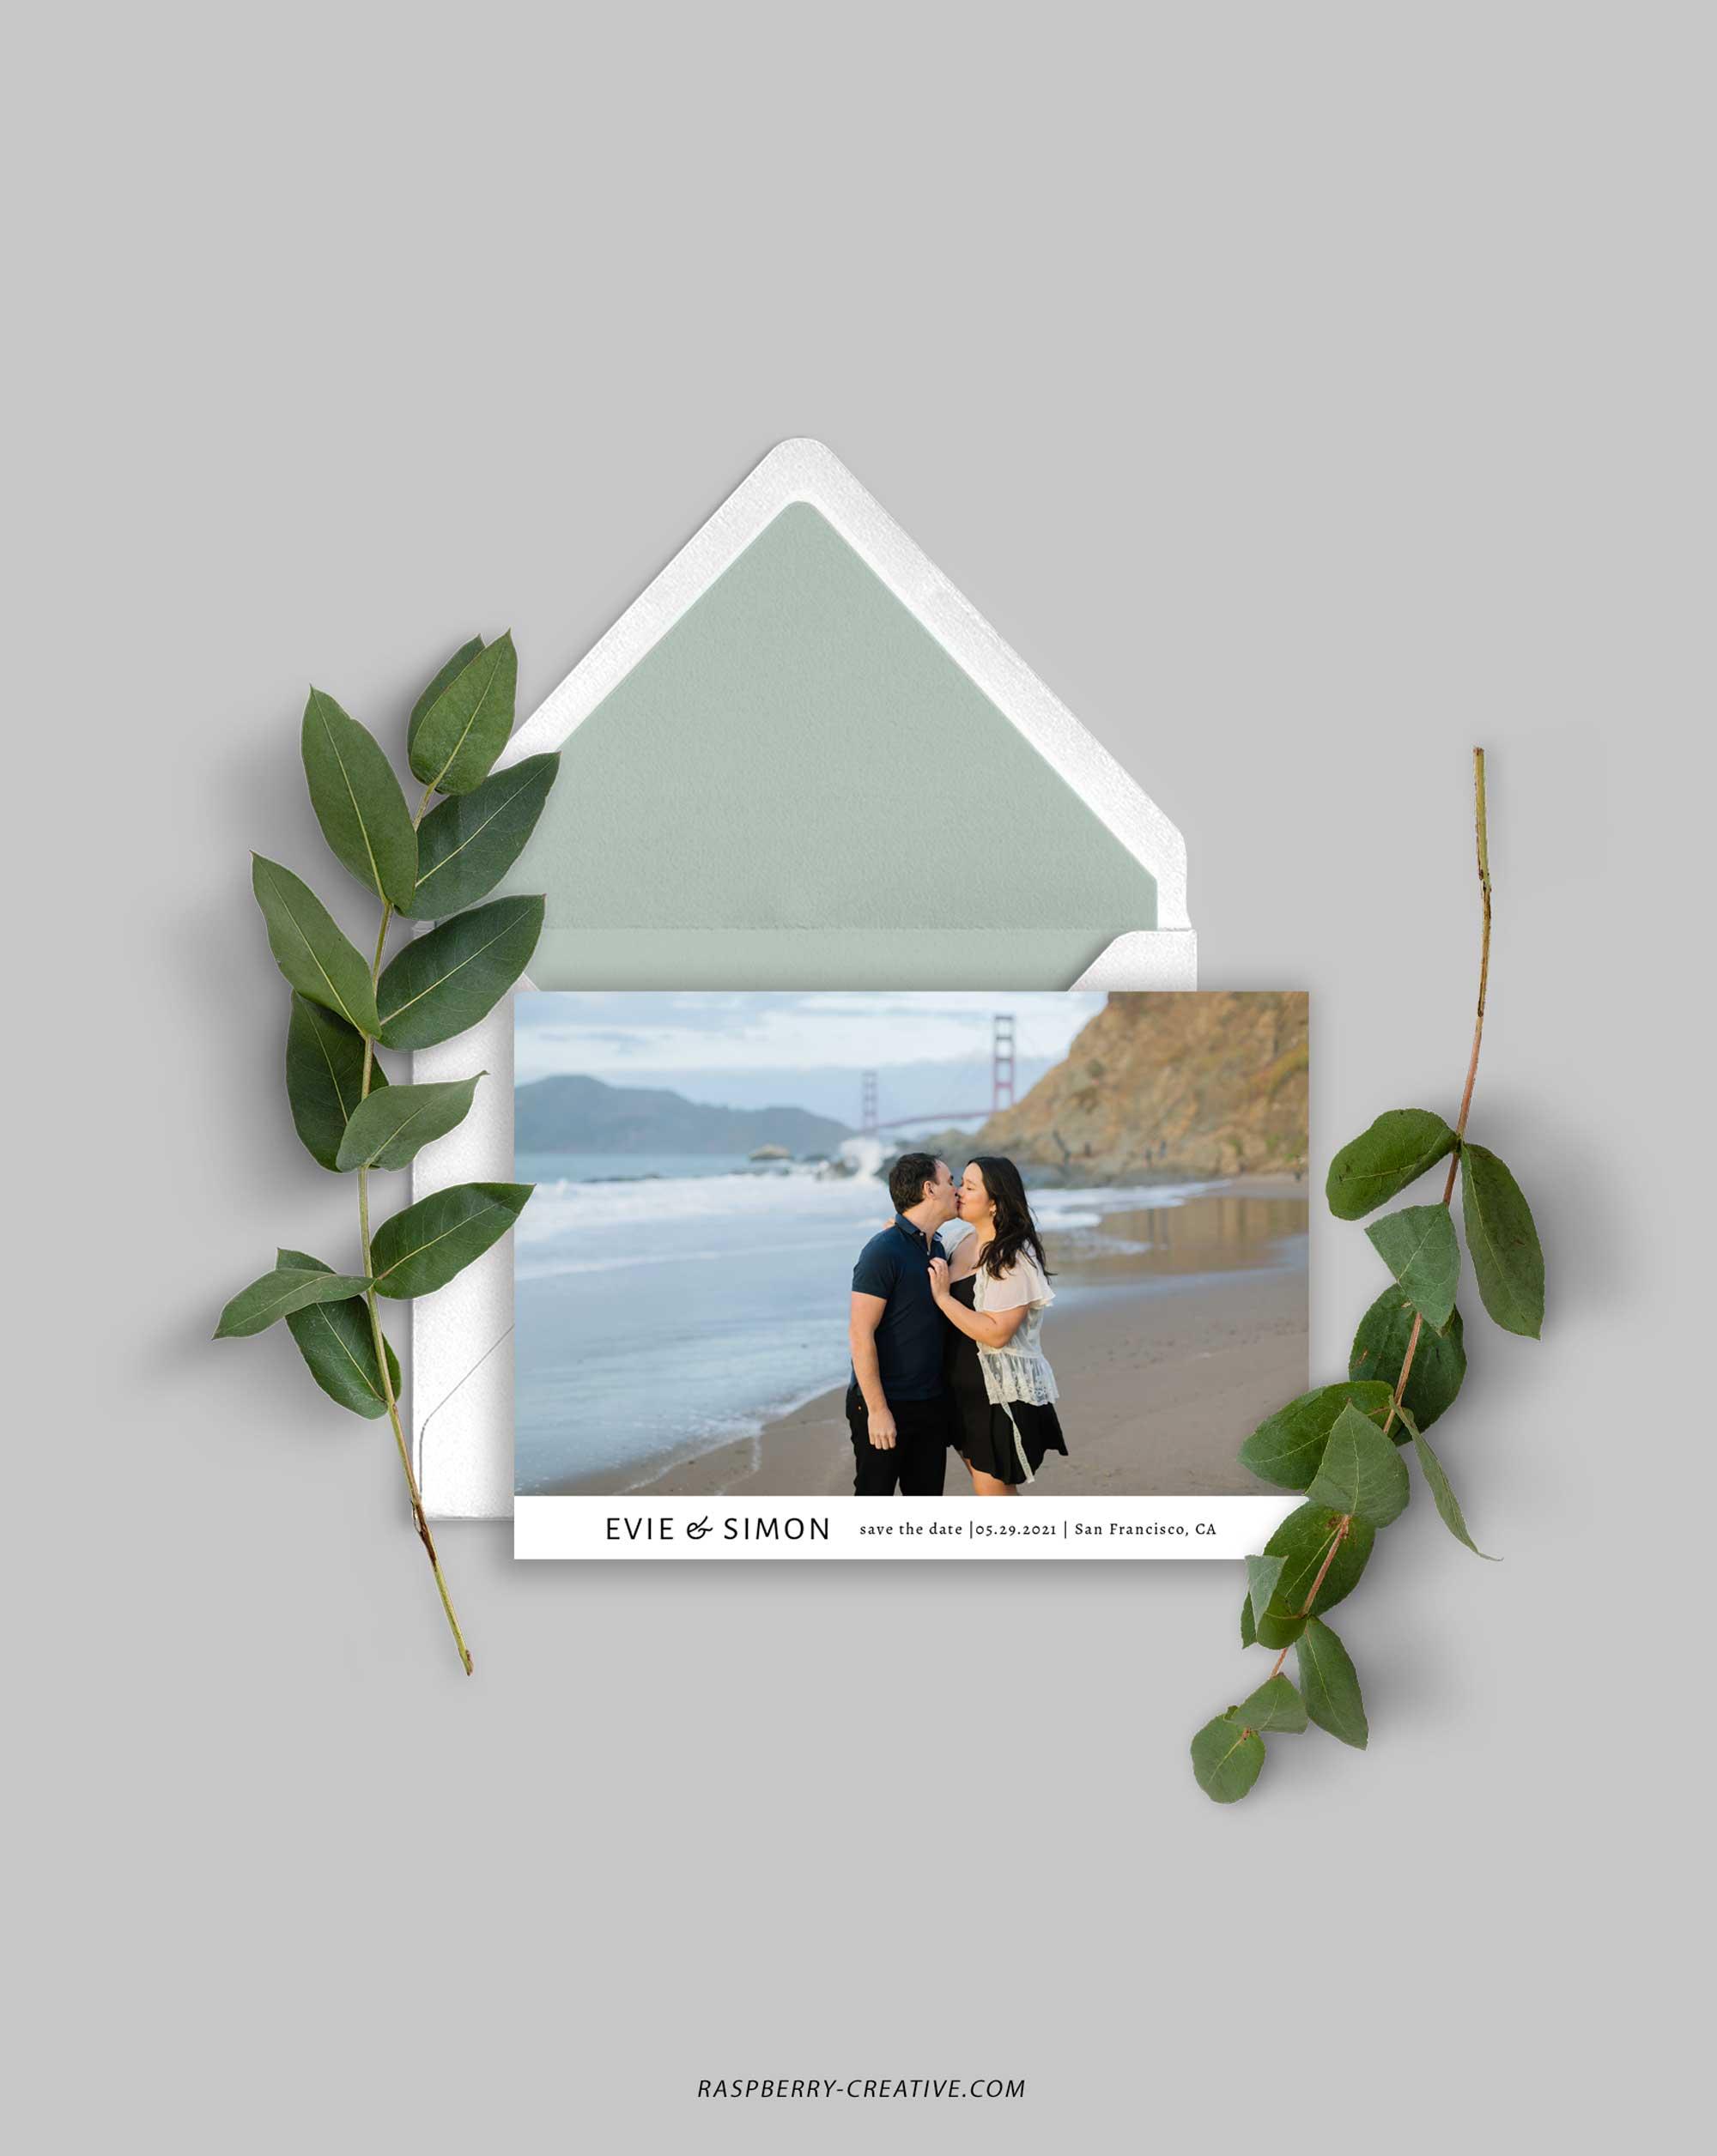 minimalist photo save the date card